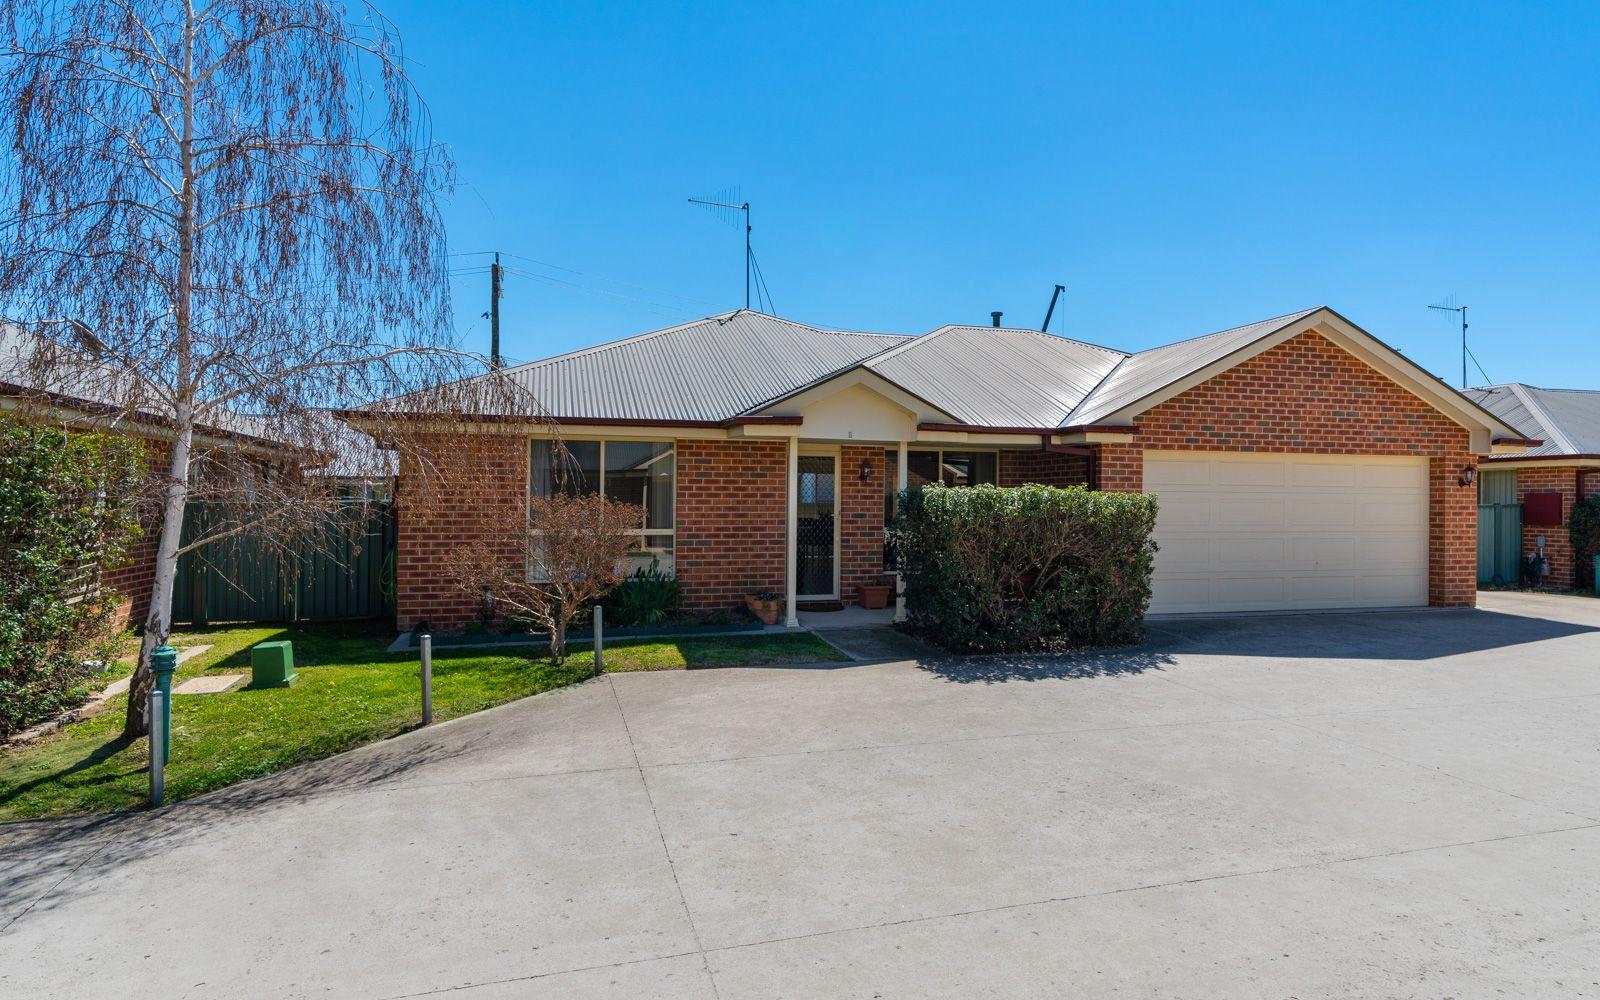 1/75 STANLEY STREET, Bathurst NSW 2795, Image 0